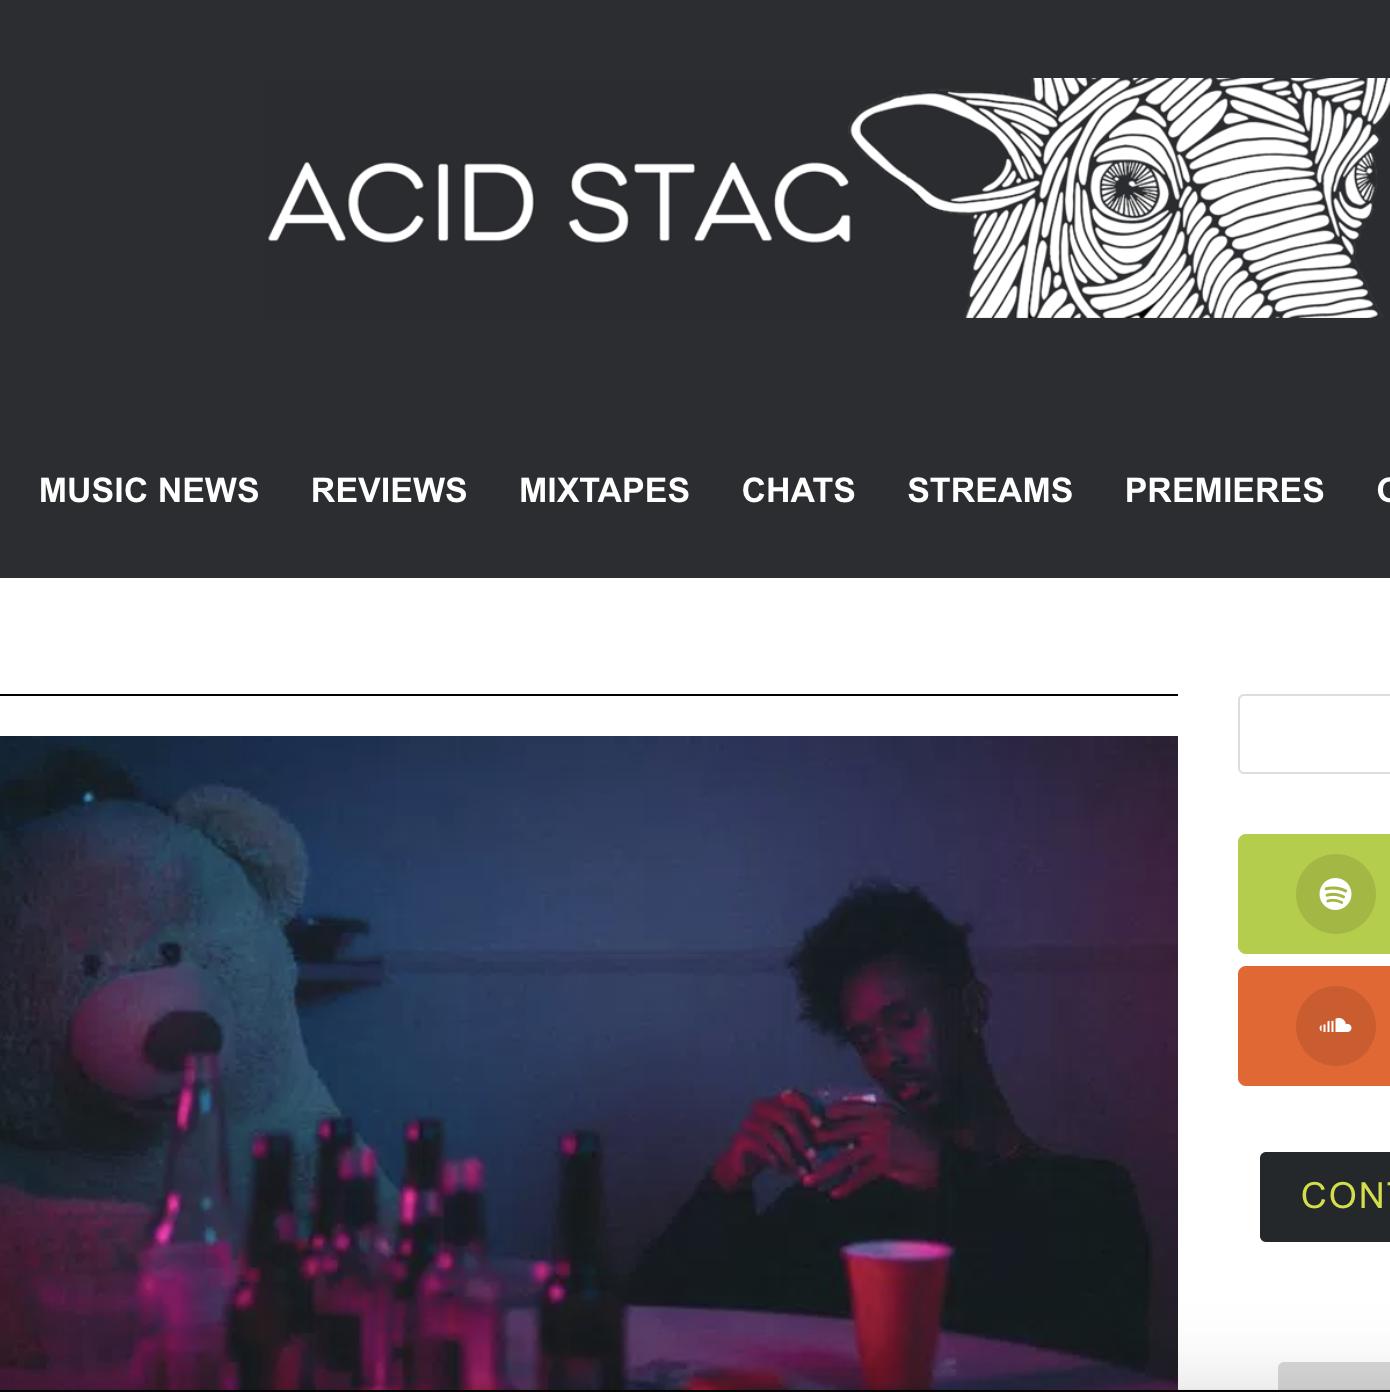 Acid Stag - April 27th 2018